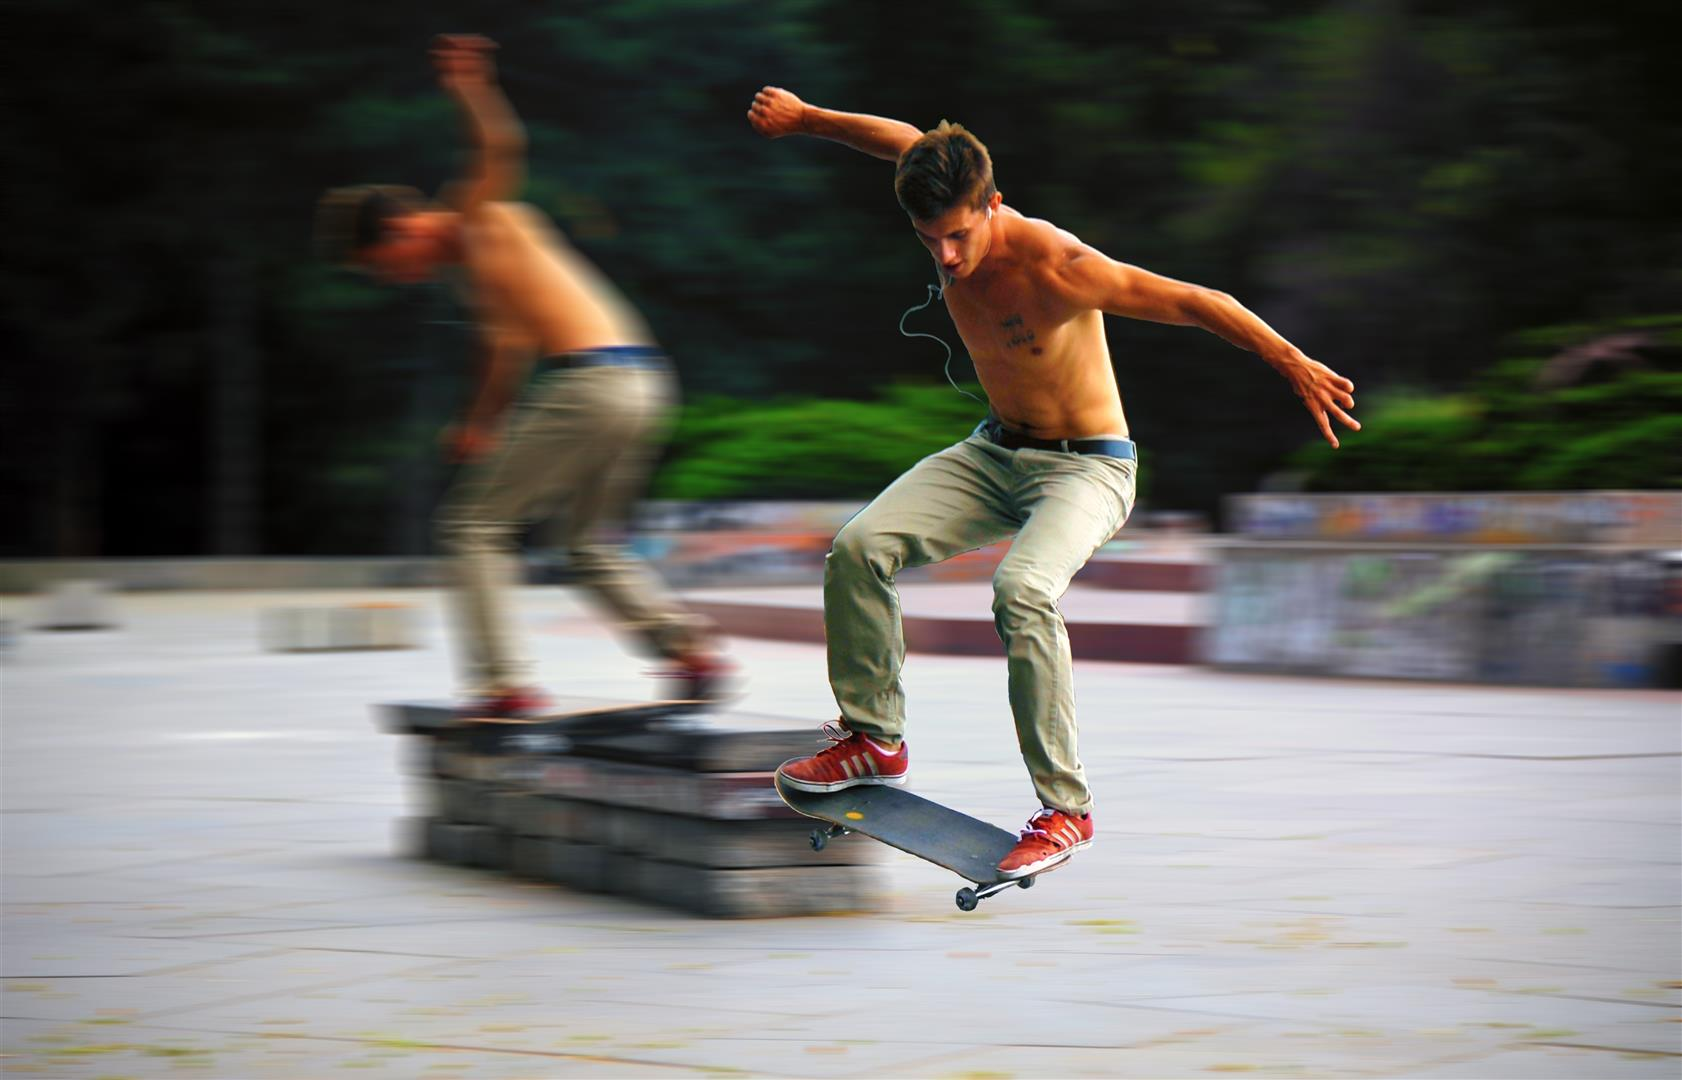 Prague Skateboarders (Large)